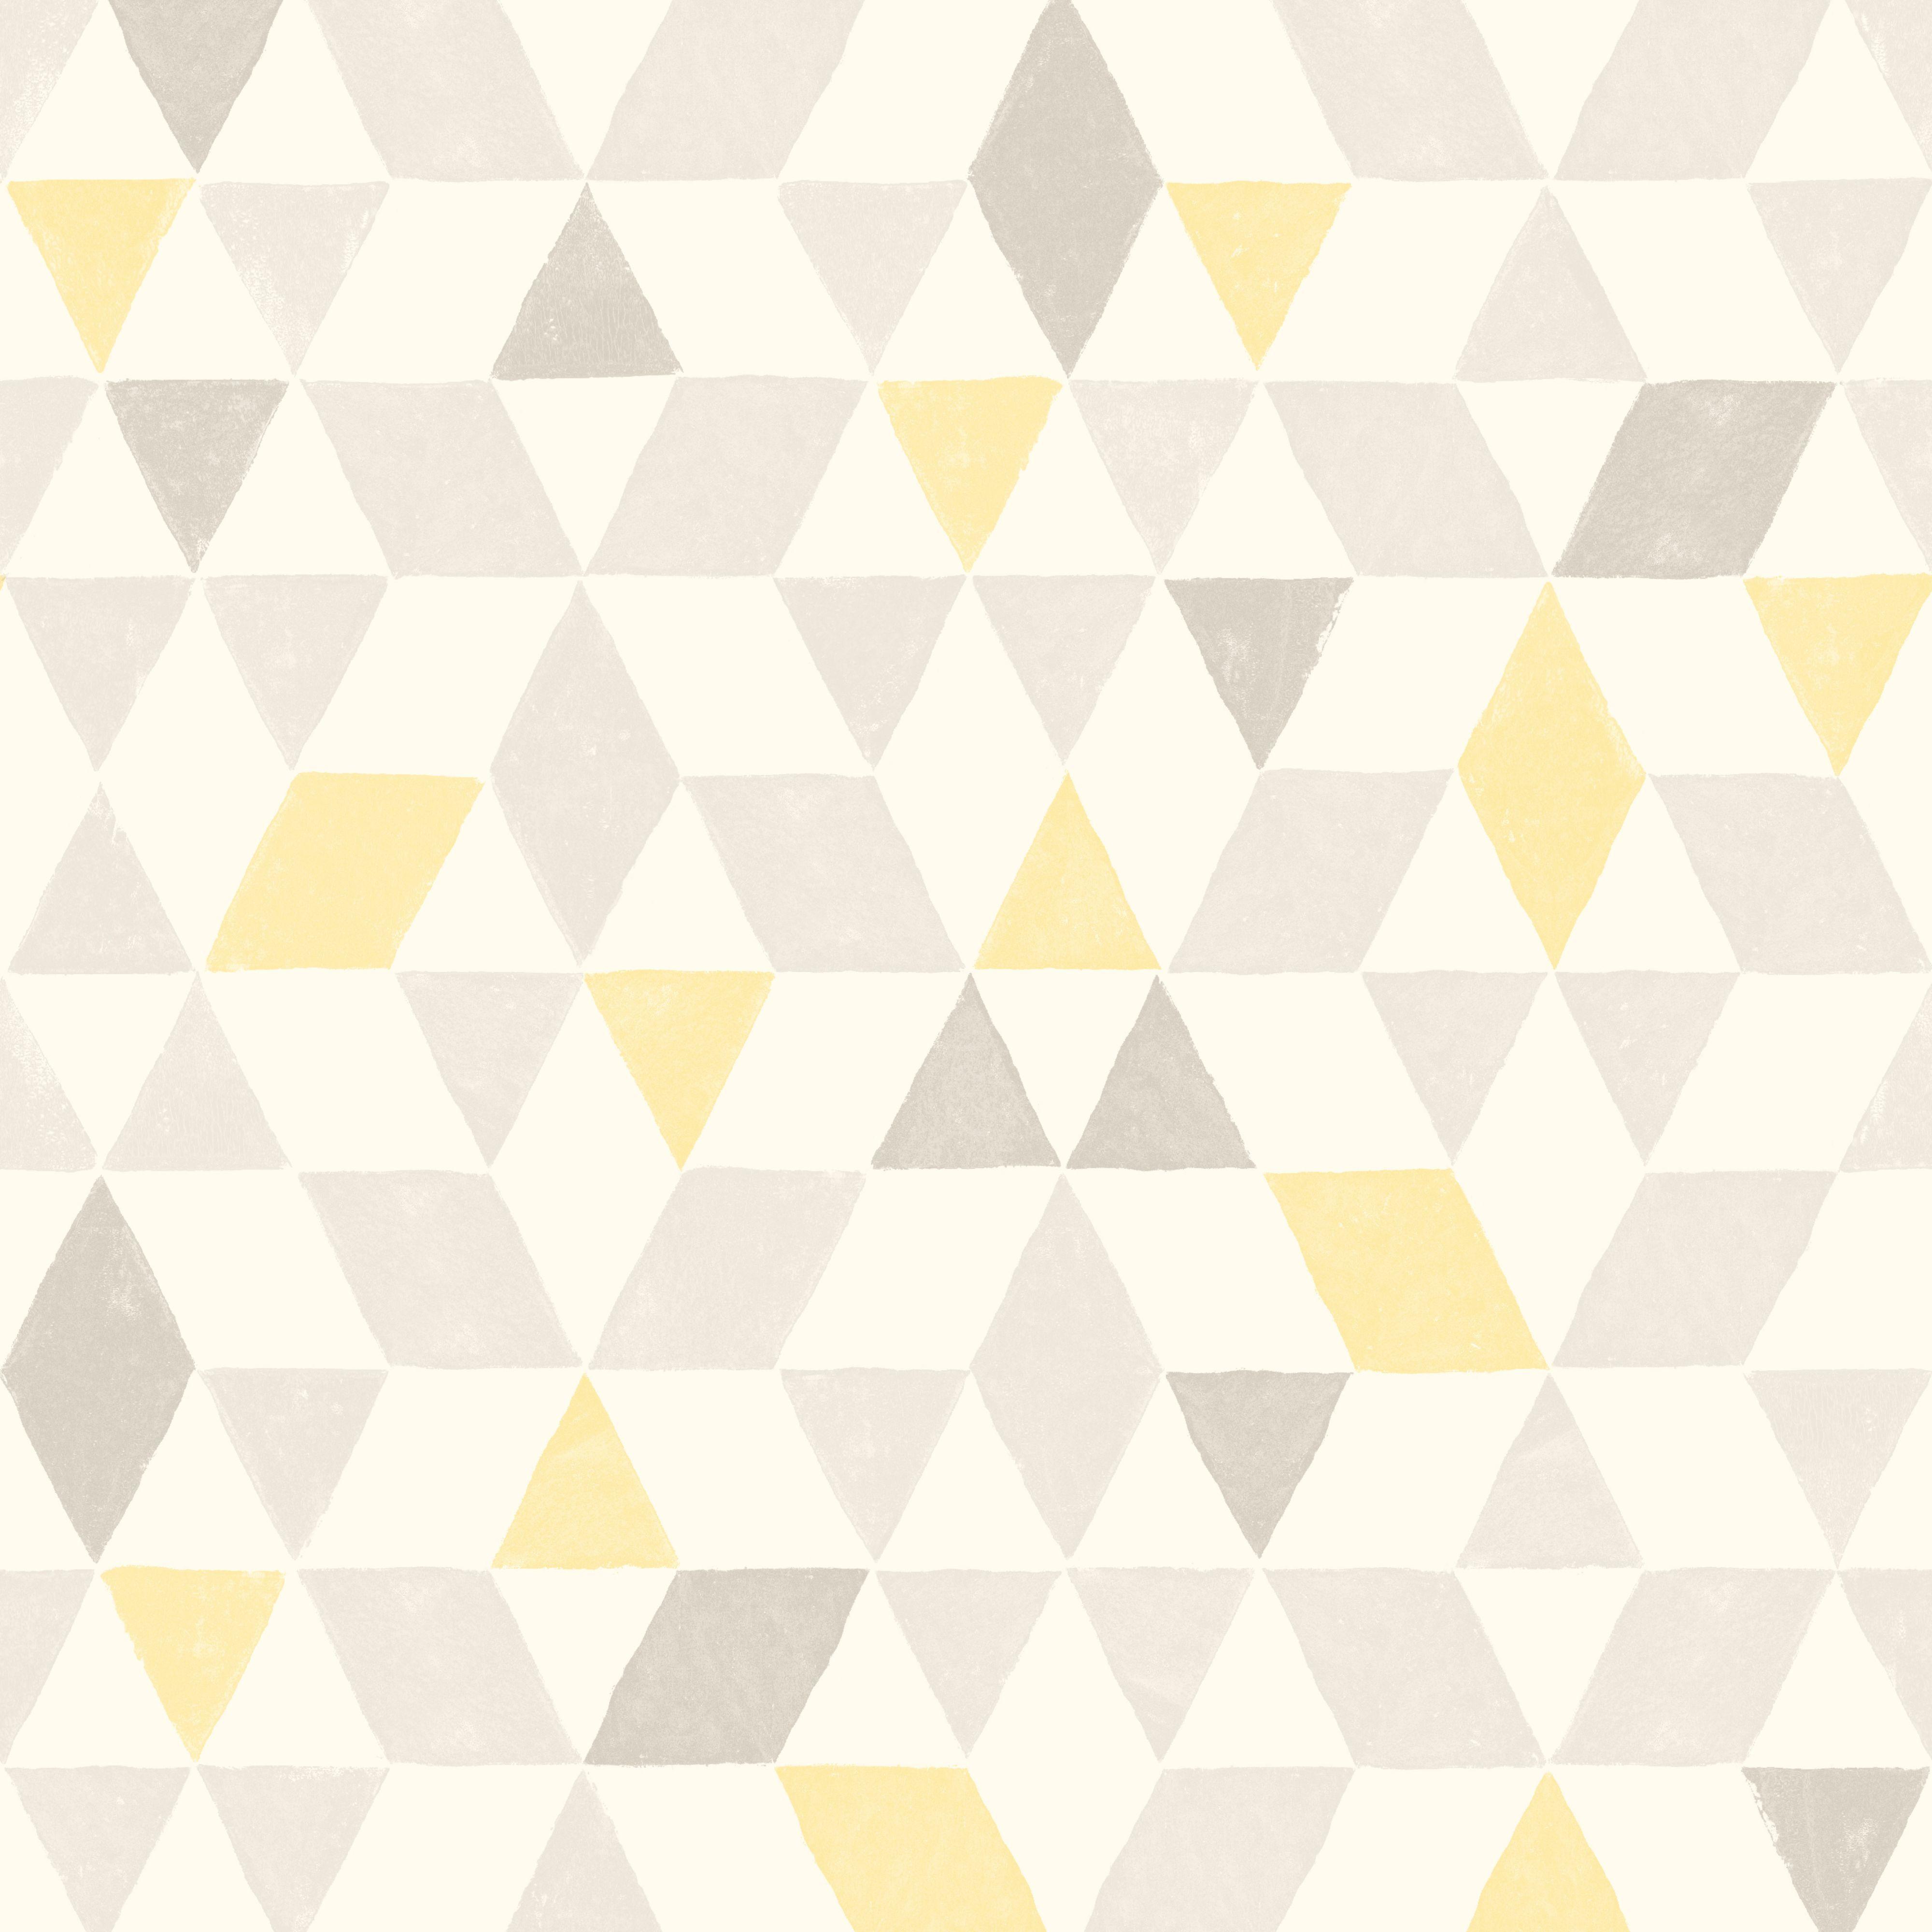 GeometricWallpaperHDiPhonewallpaper Geometric